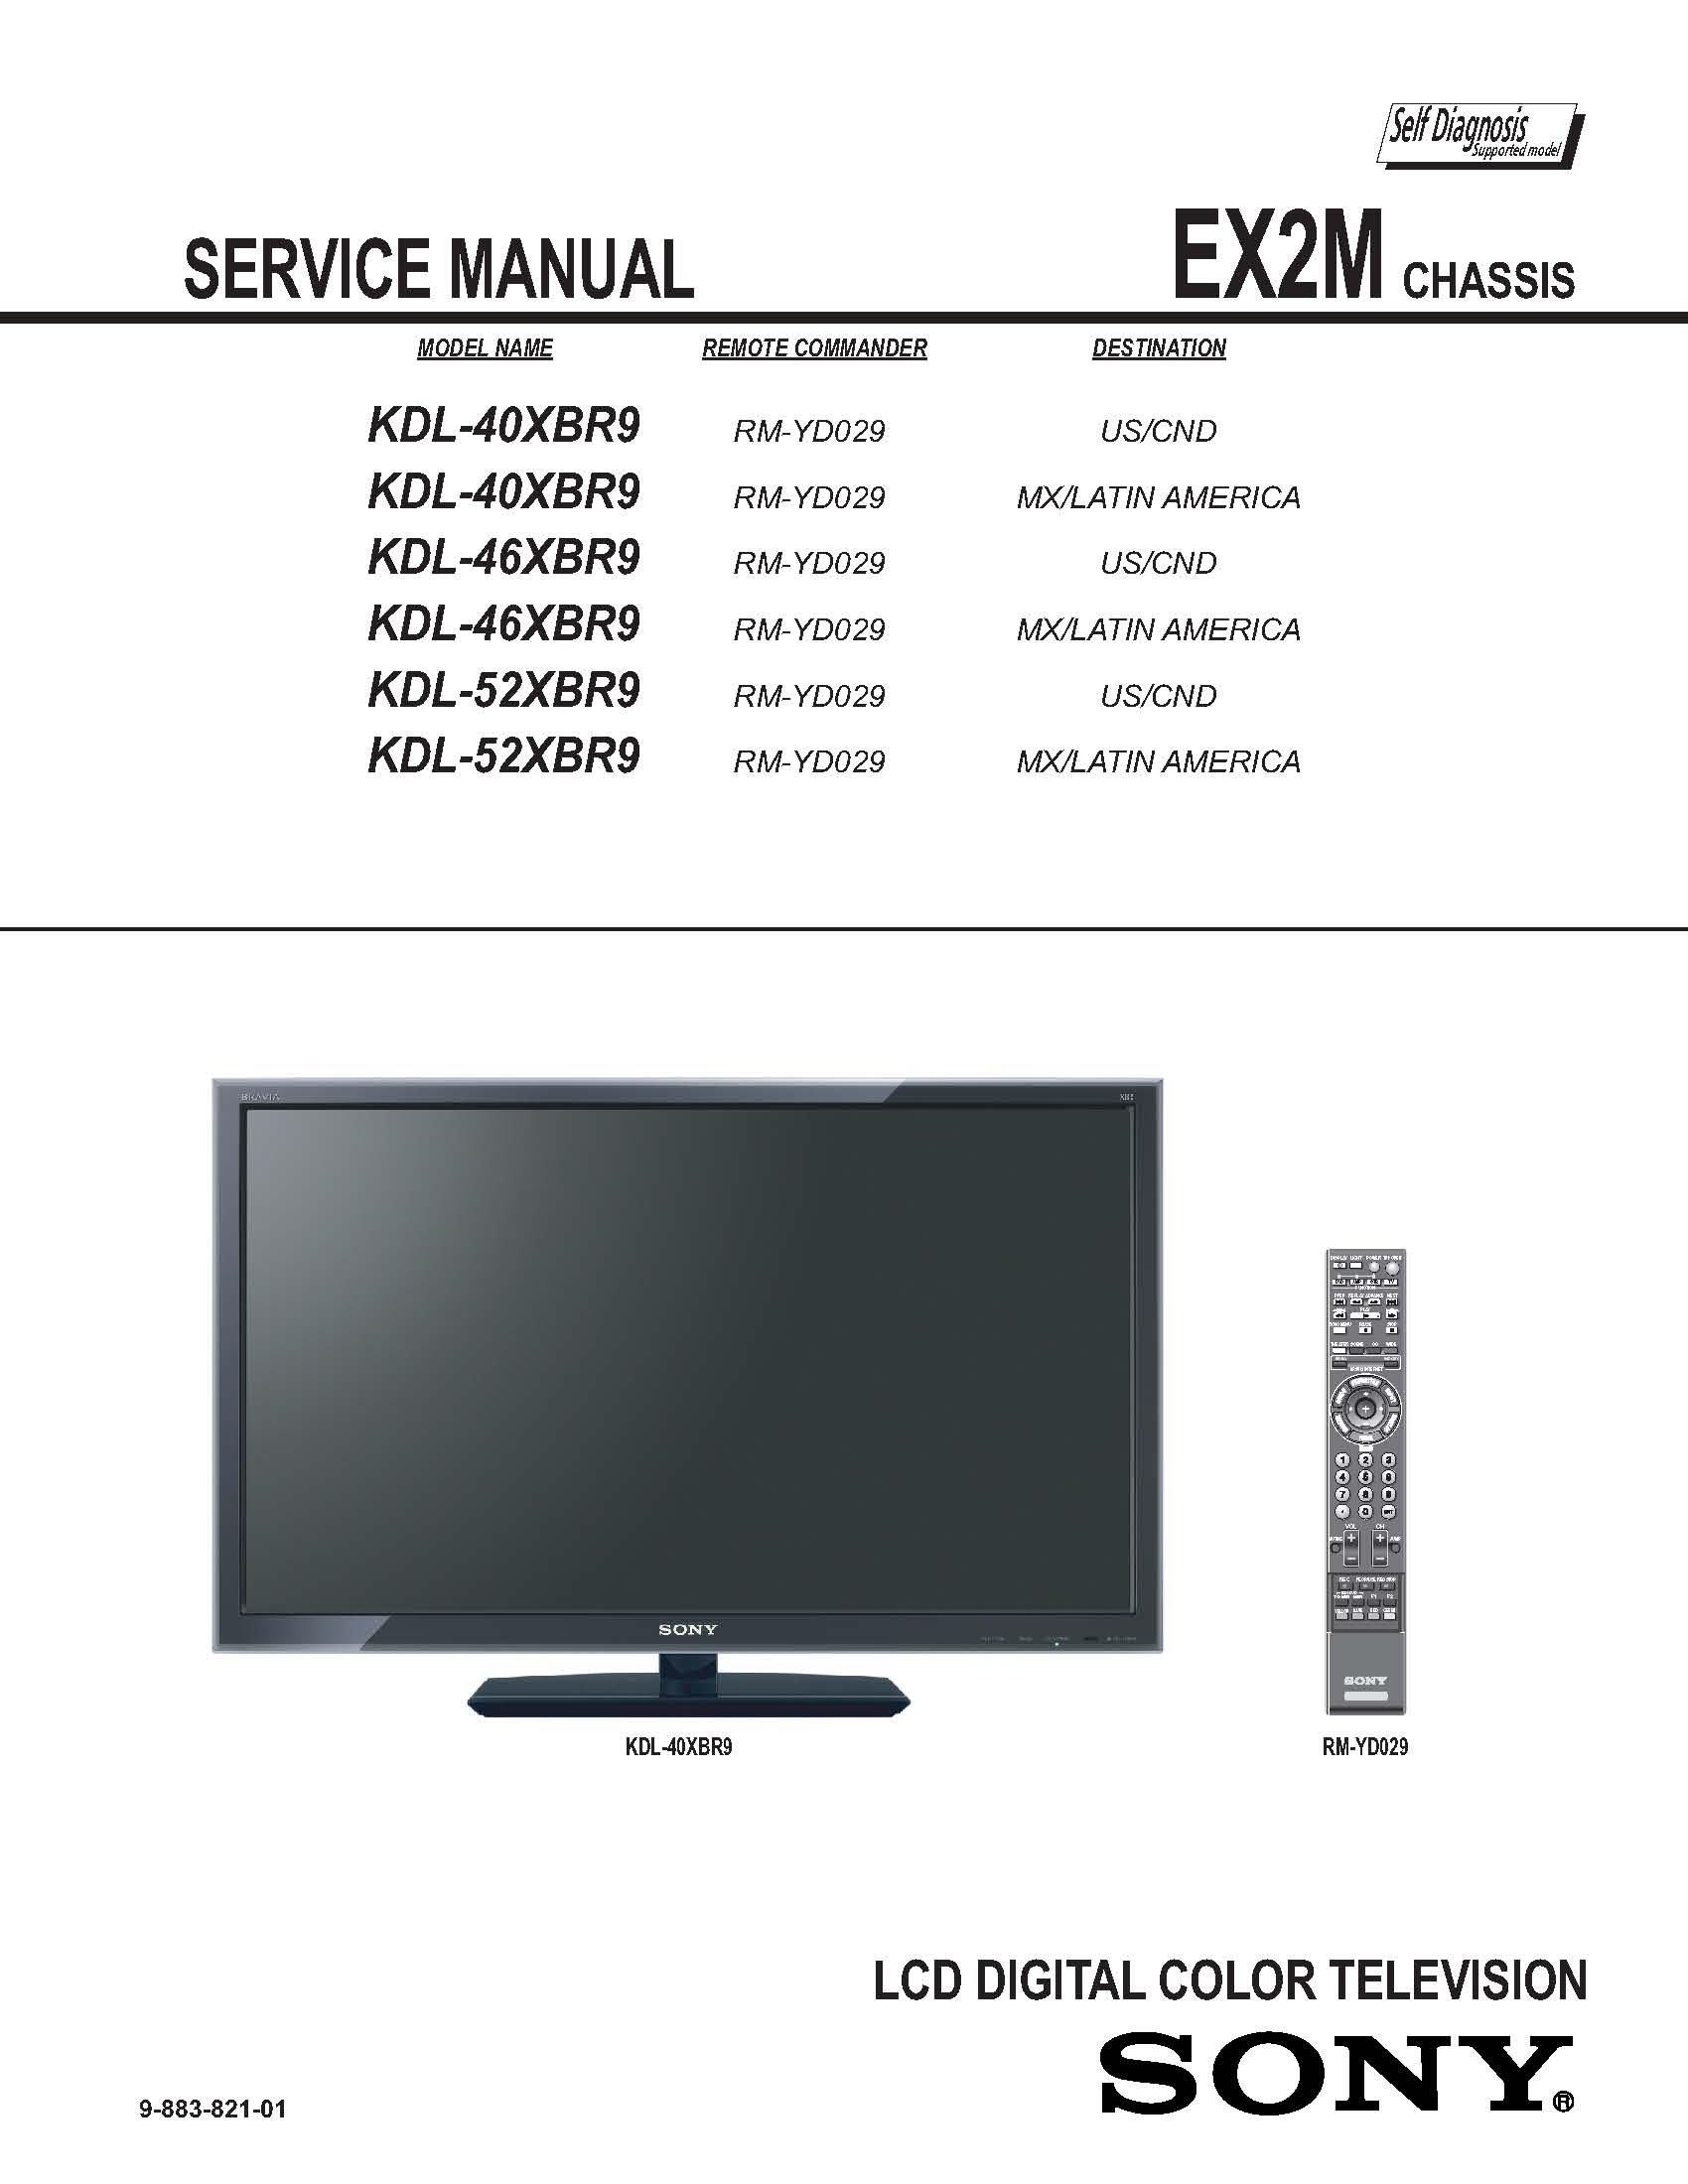 Sony bravia kdl-46xbr9 ota tv guide no data.